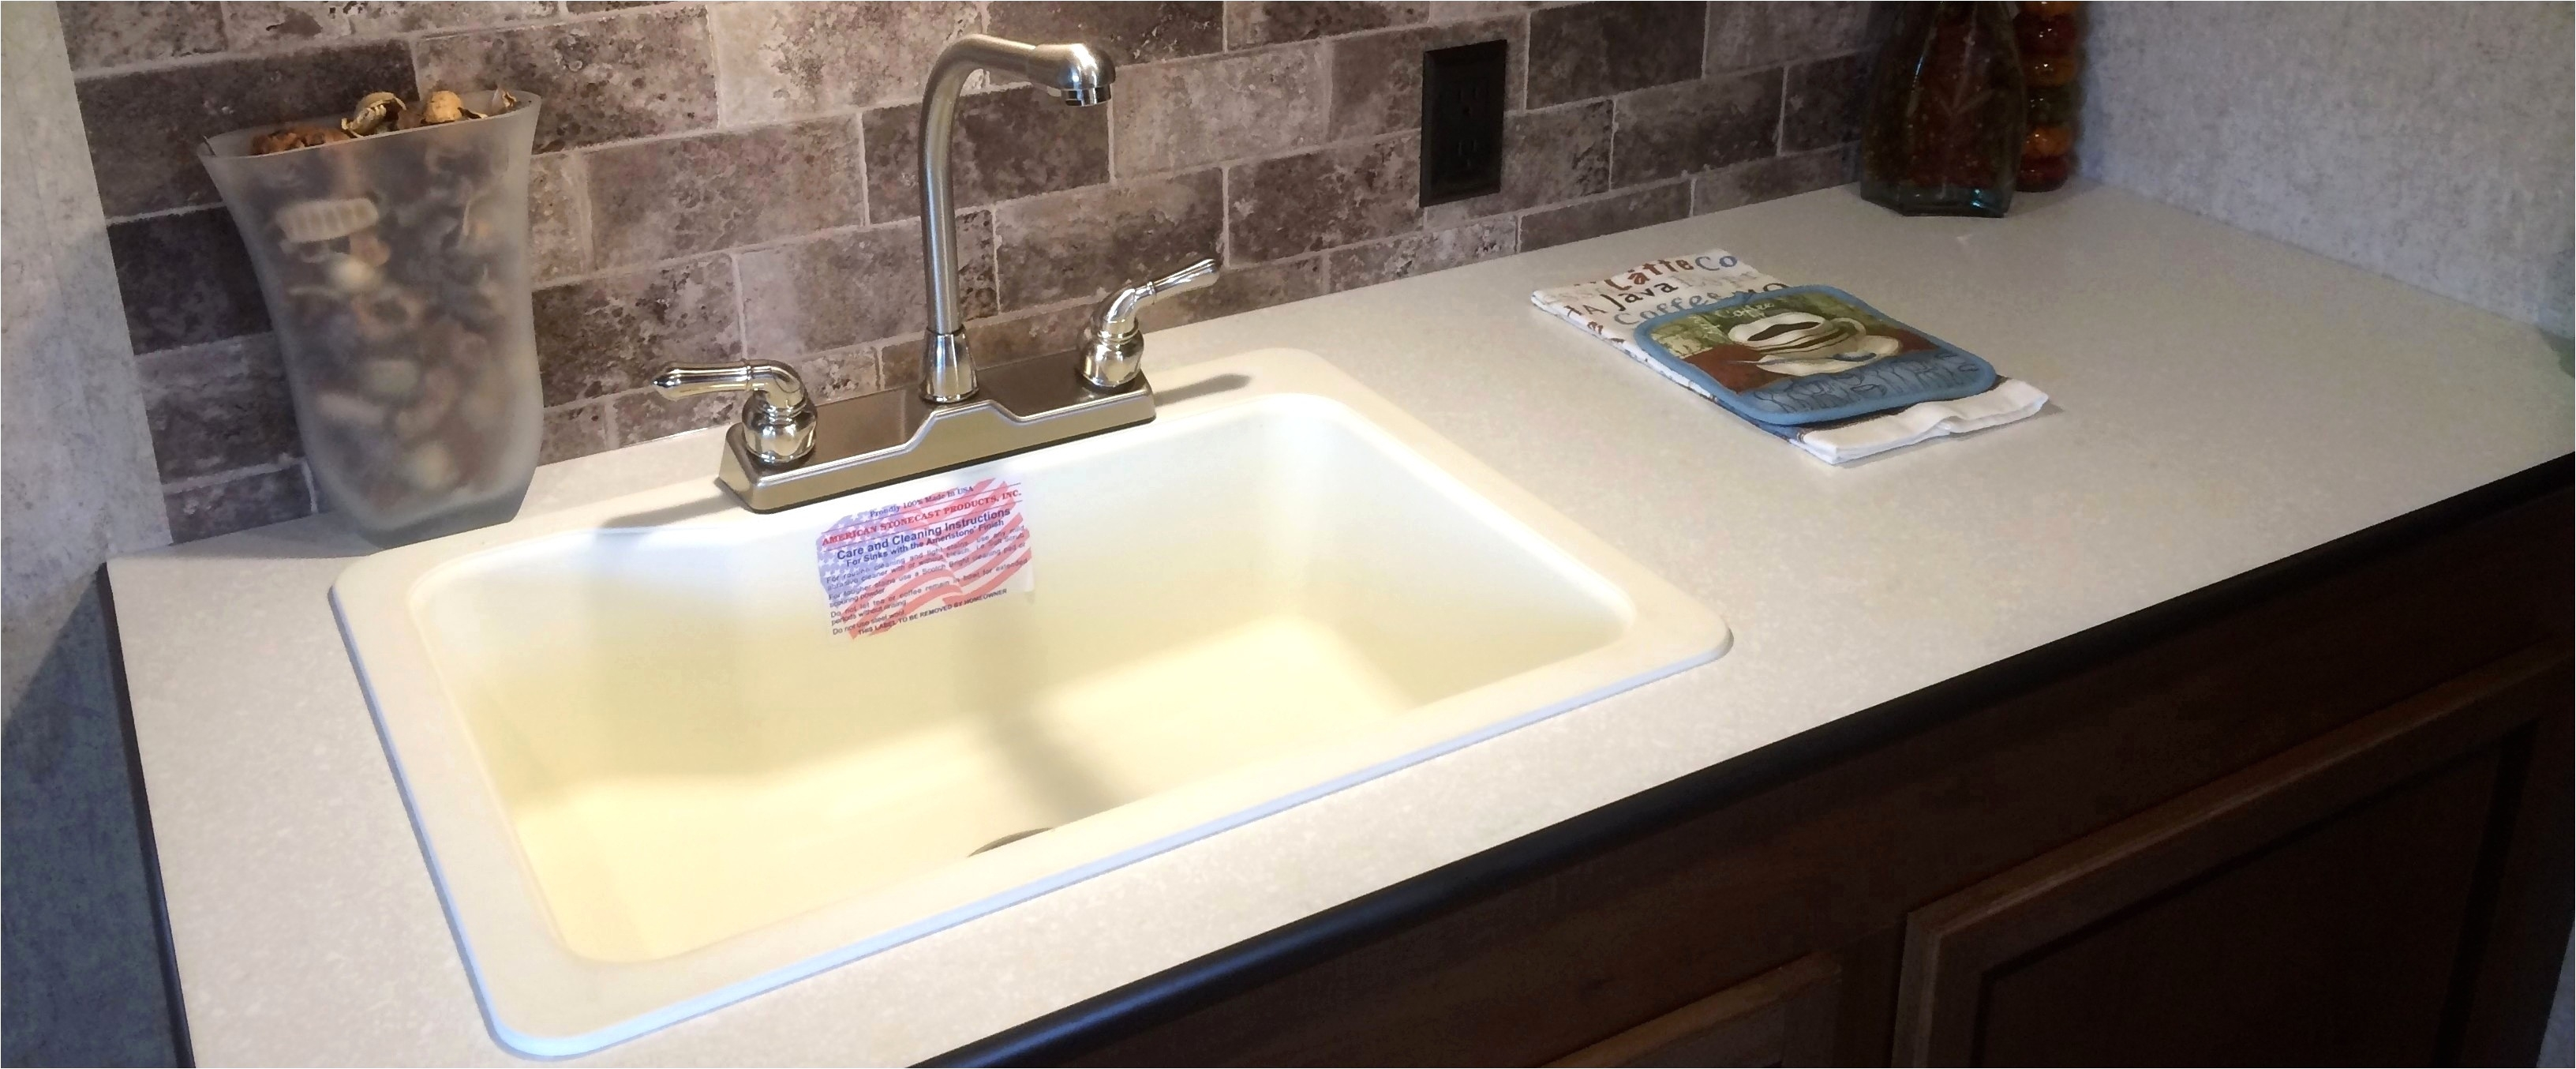 20 Beautiful Kitchen and Bathroom Design Ideas